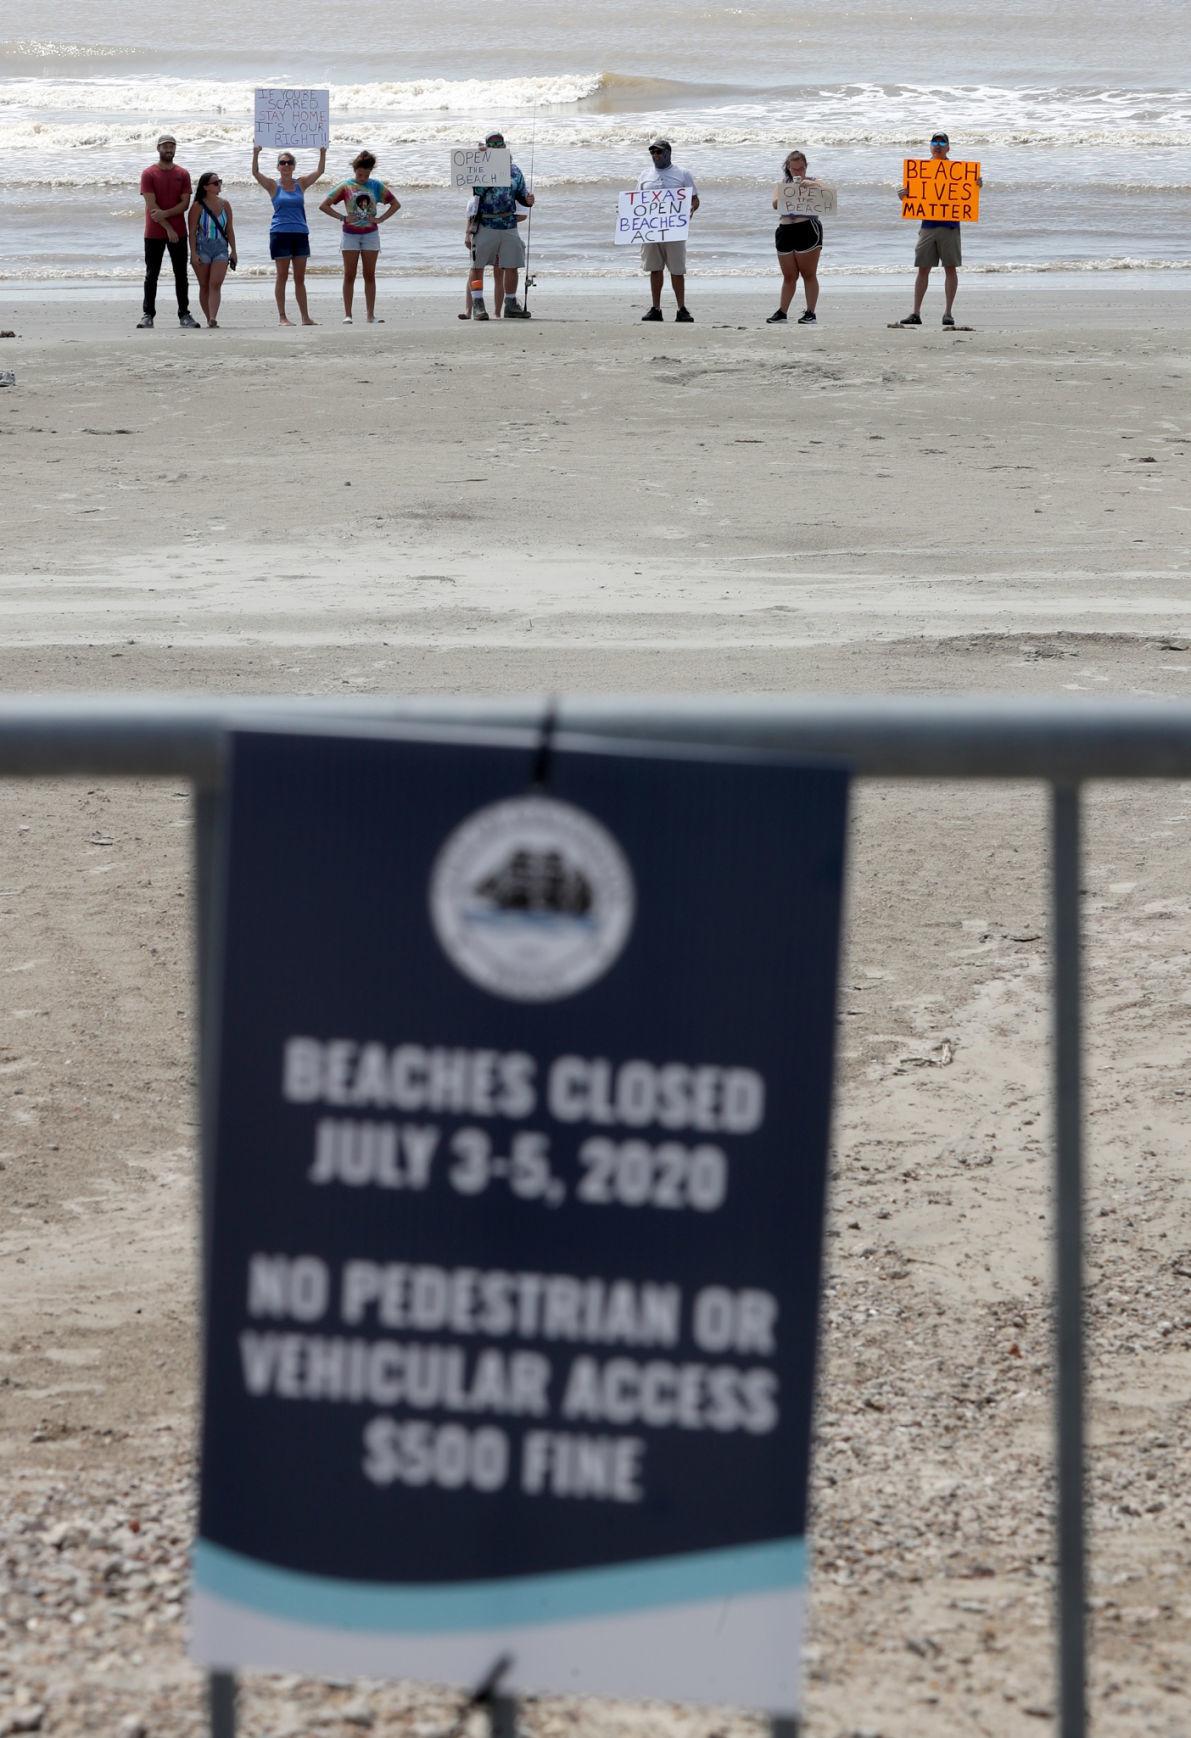 Beach closure prompts protest